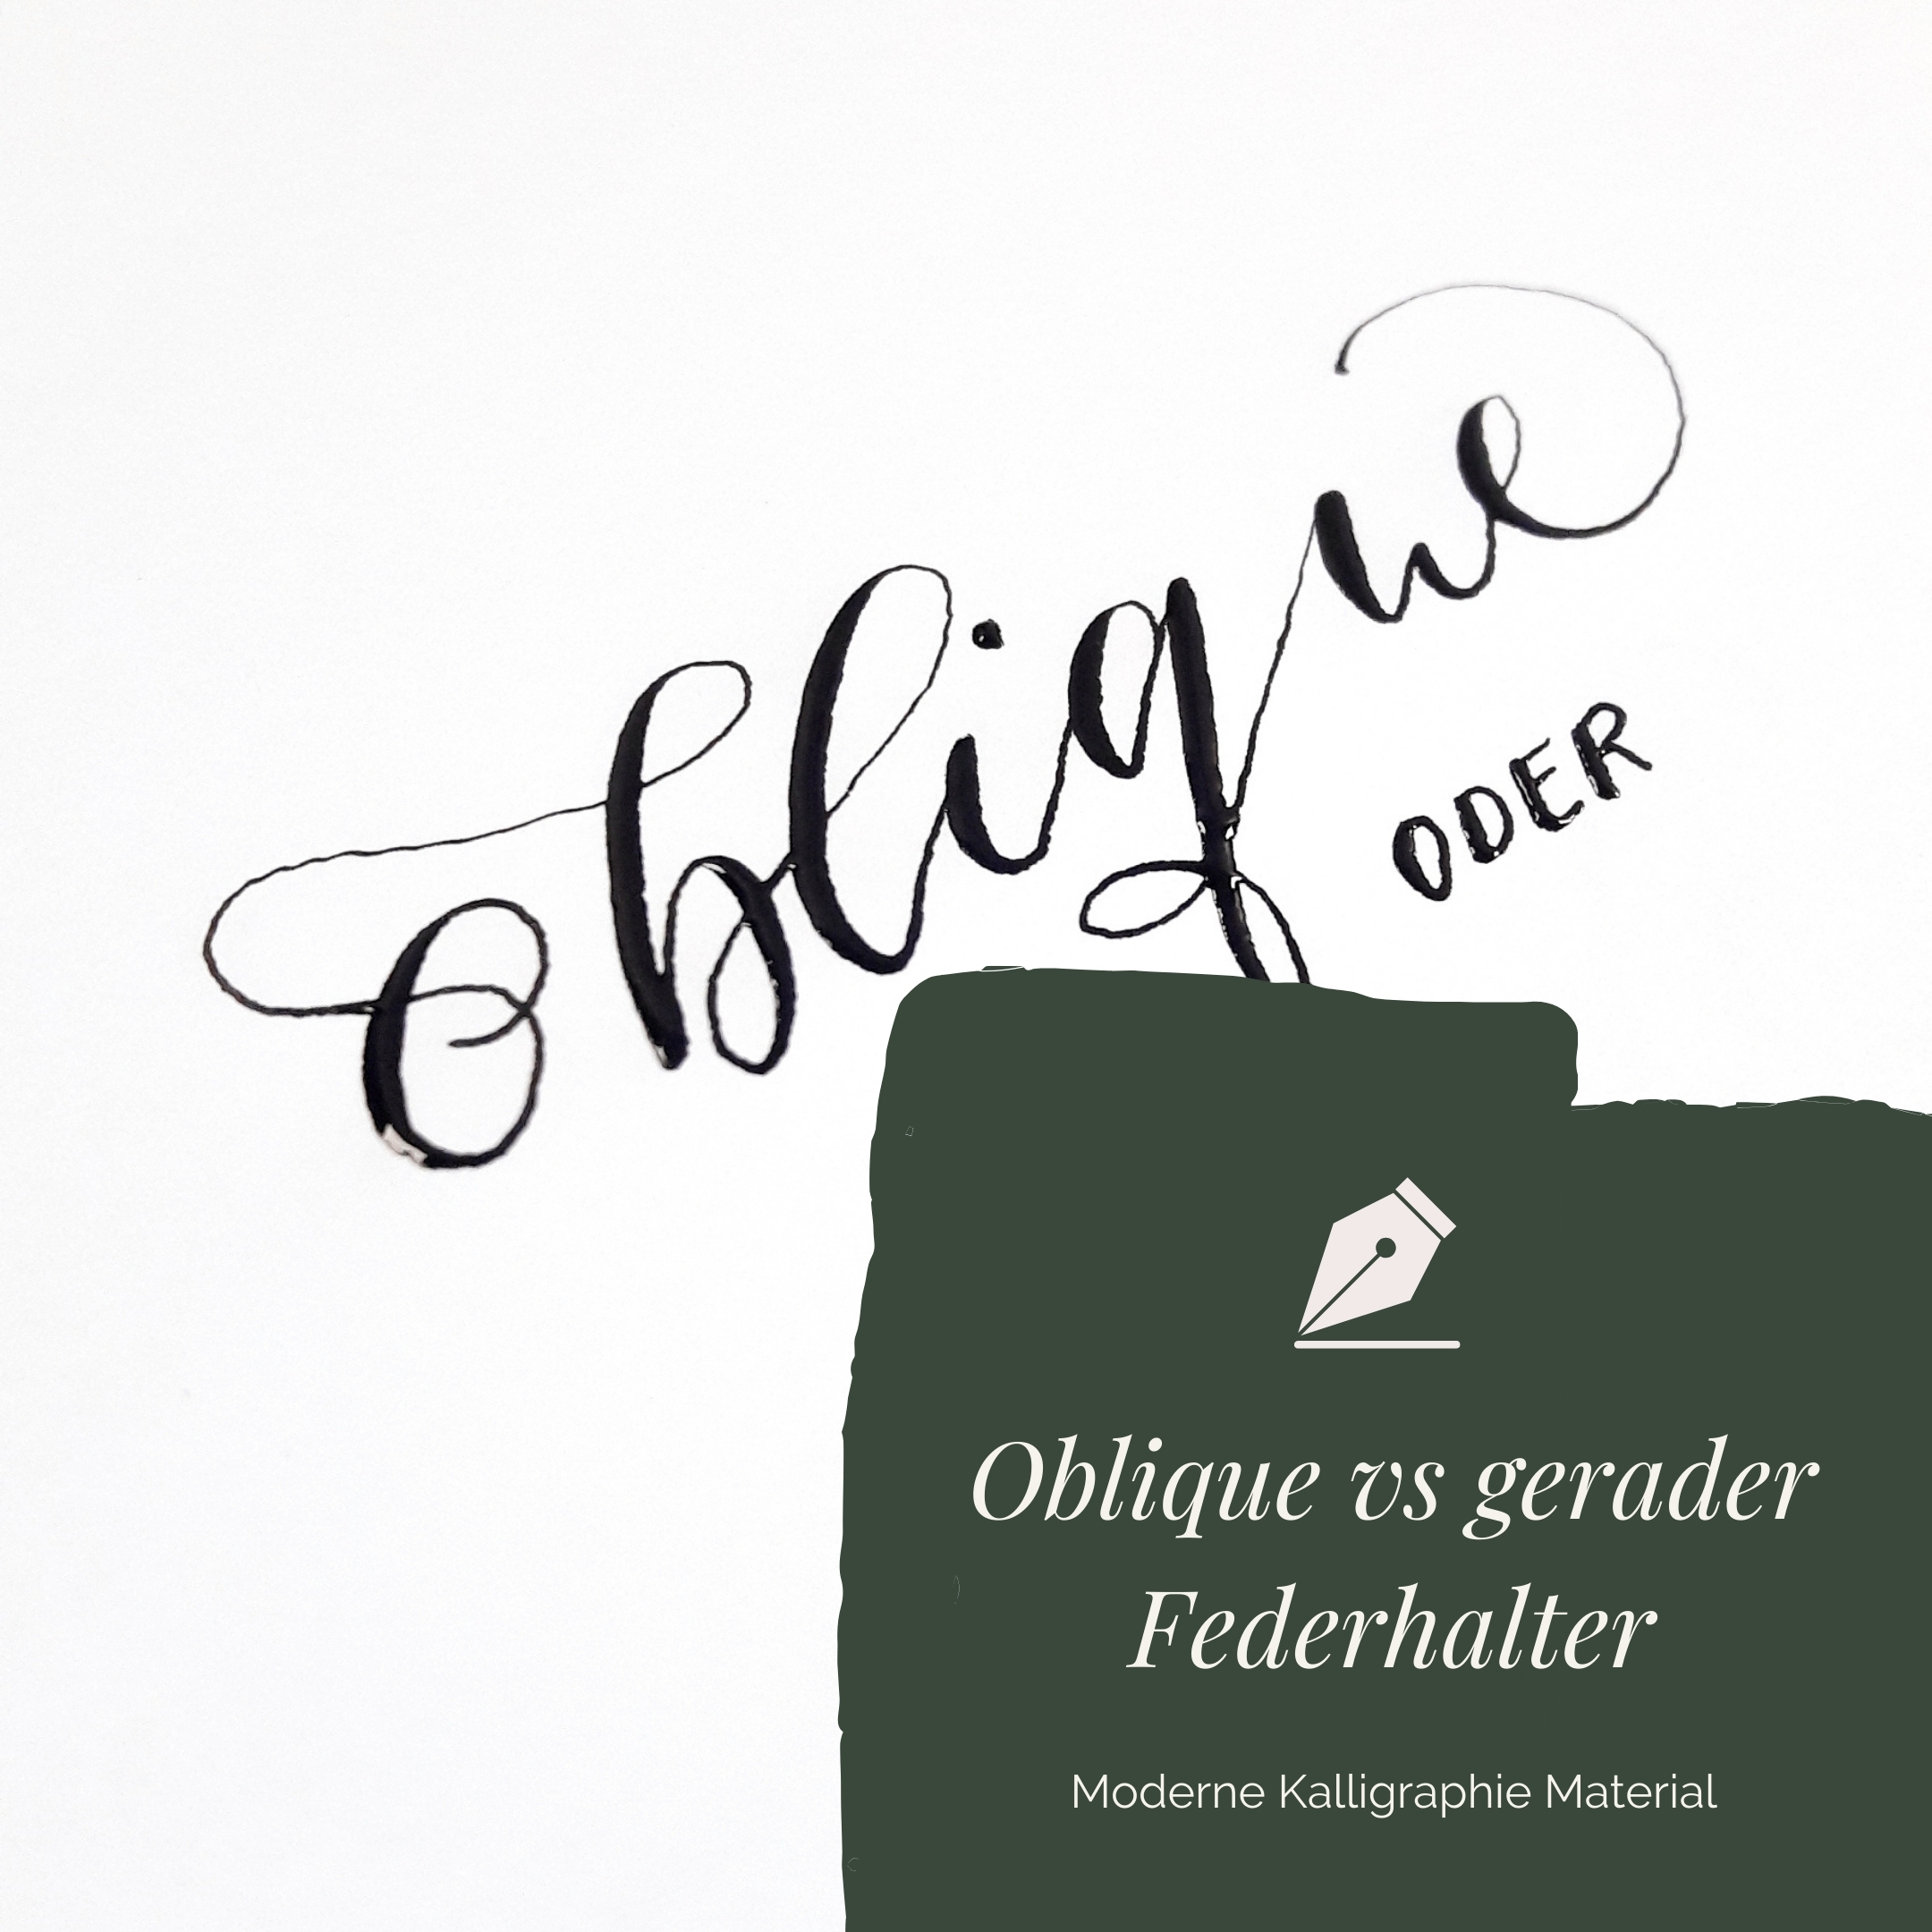 Oblique vs gerader Kalligraphie Federhalter, Bild zum Blog-Beitrag irma link Kalligraphie